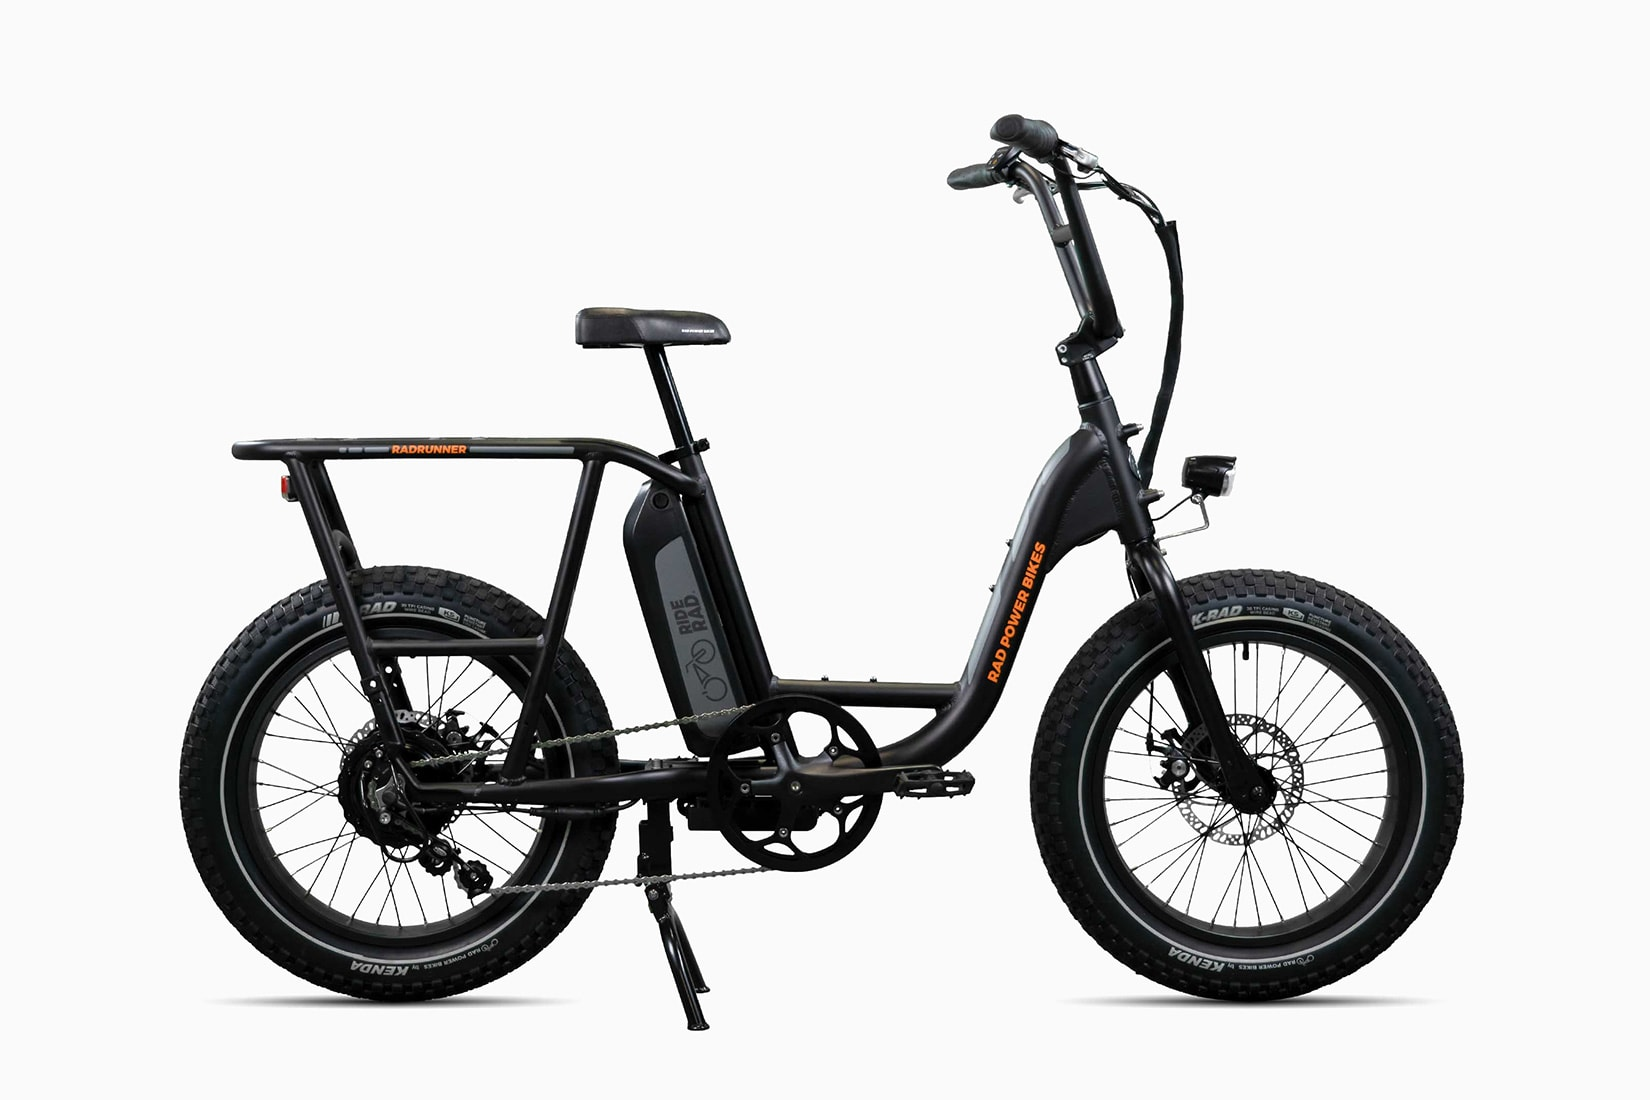 best electric bikes commuting radrunner review - Luxe Digital